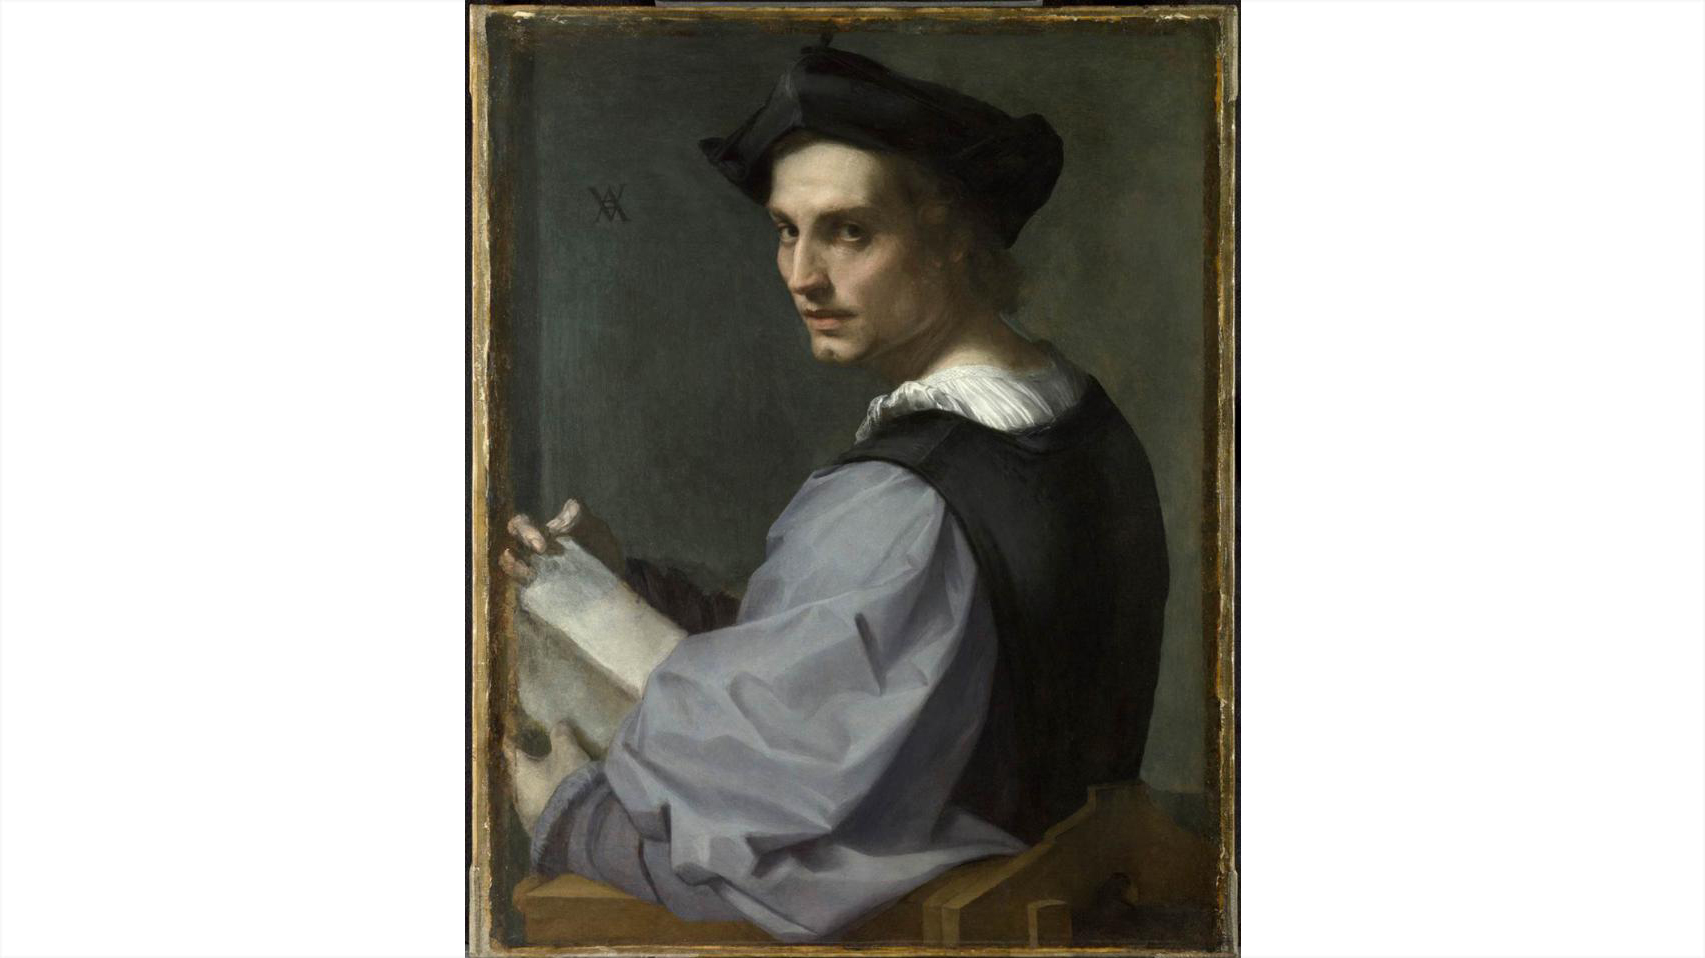 """Andrea del Sarto: The Renaissance Workshop in Action"""